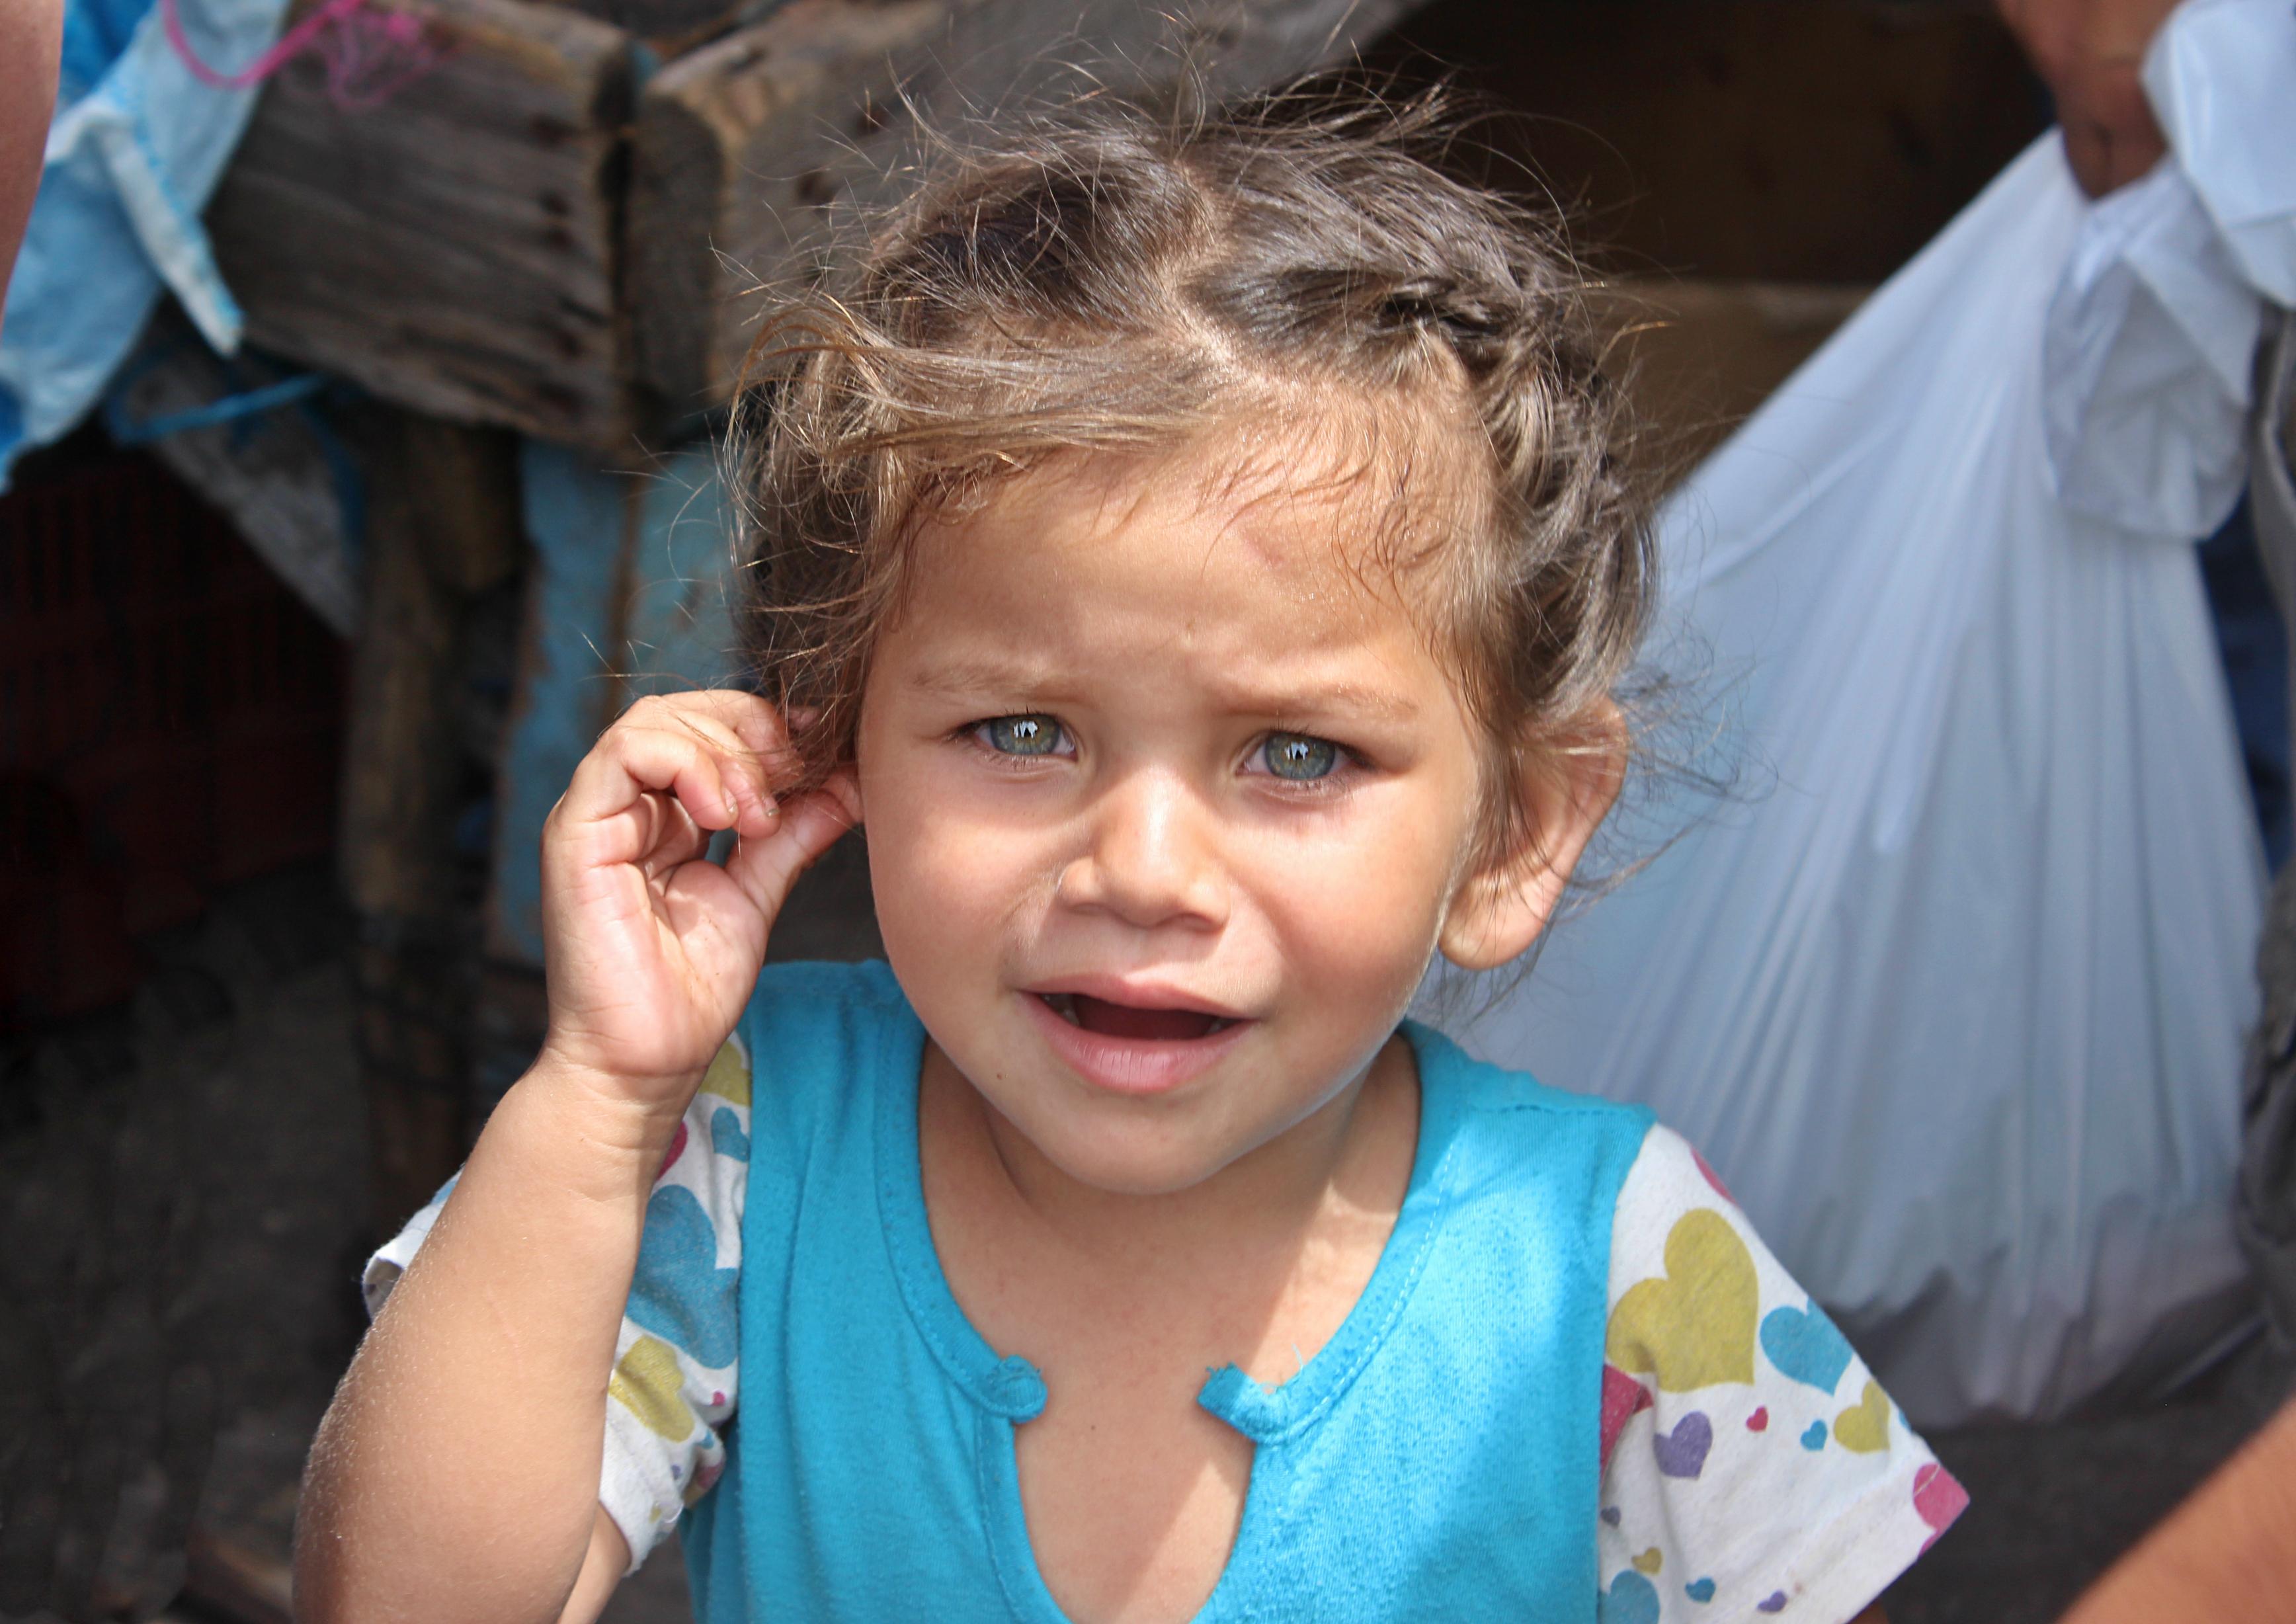 Four-year-old Génesis Naomi Sierra cries while walking through El Mayoreo, Tegucigalpa's farmers market, with her mother. (María José Burgos/CBC)